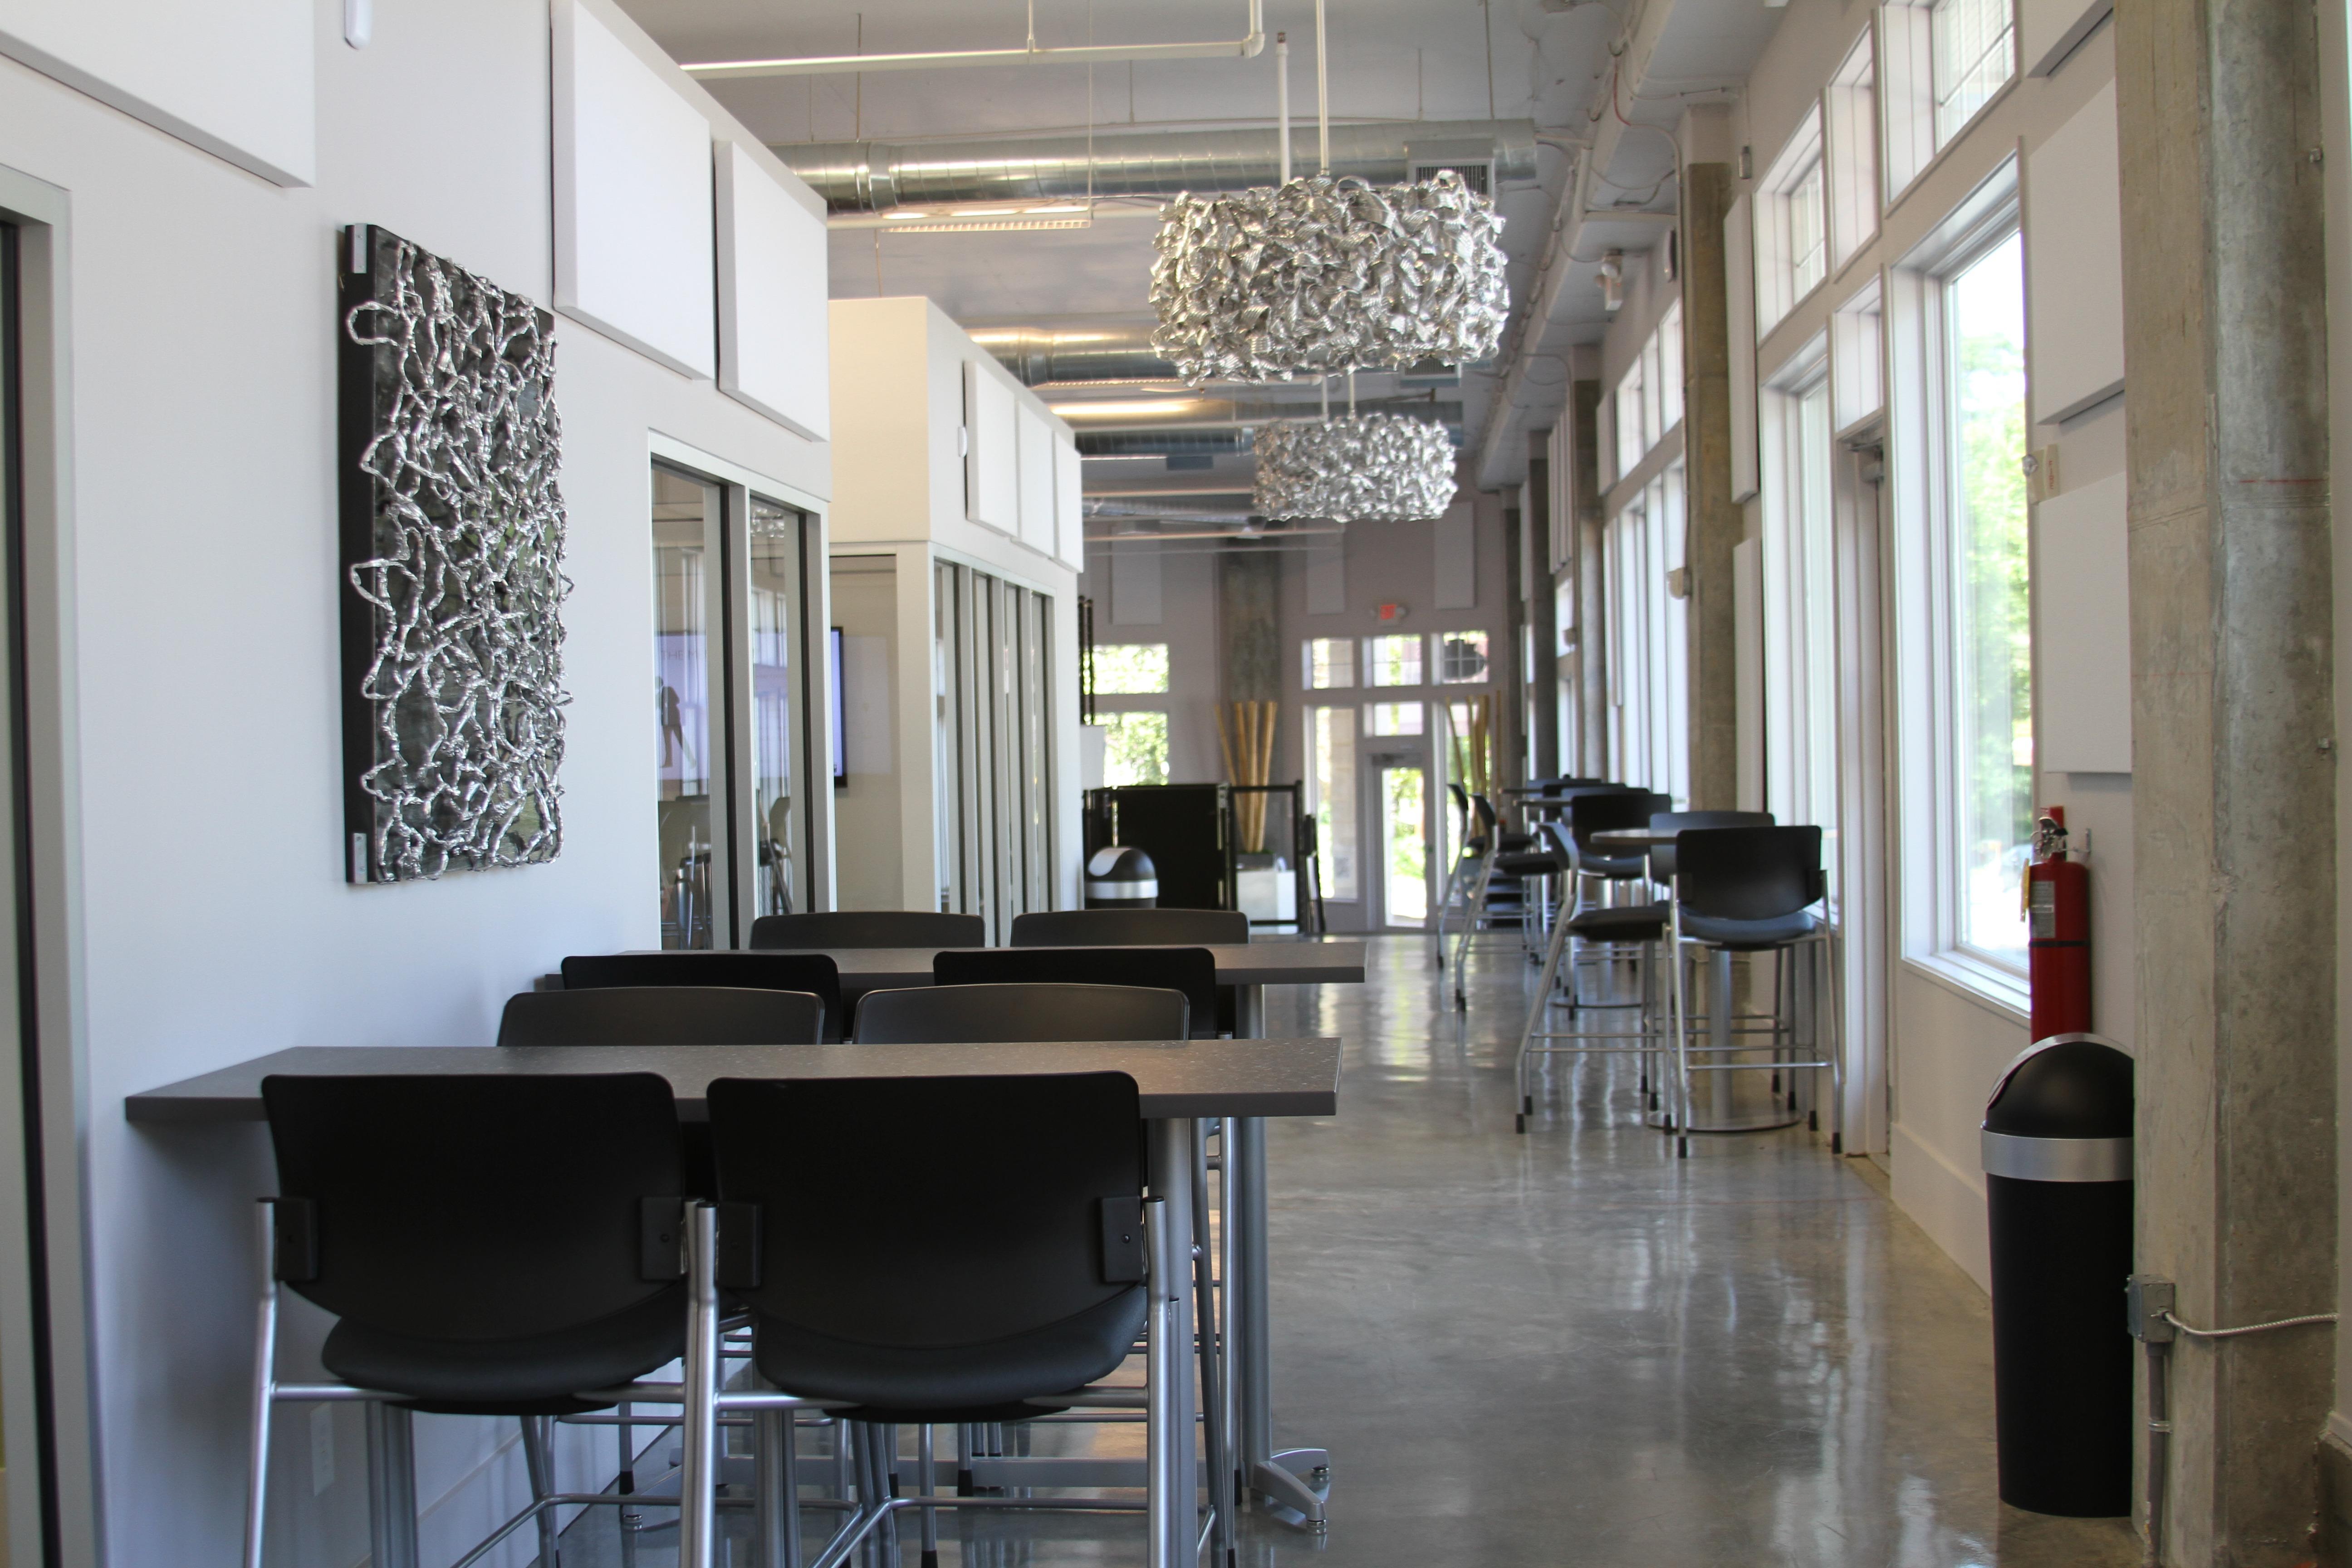 Floor Interior Building Home Loft Office Property Living Room Room Lighting  Decor Modern Conference Room Interior